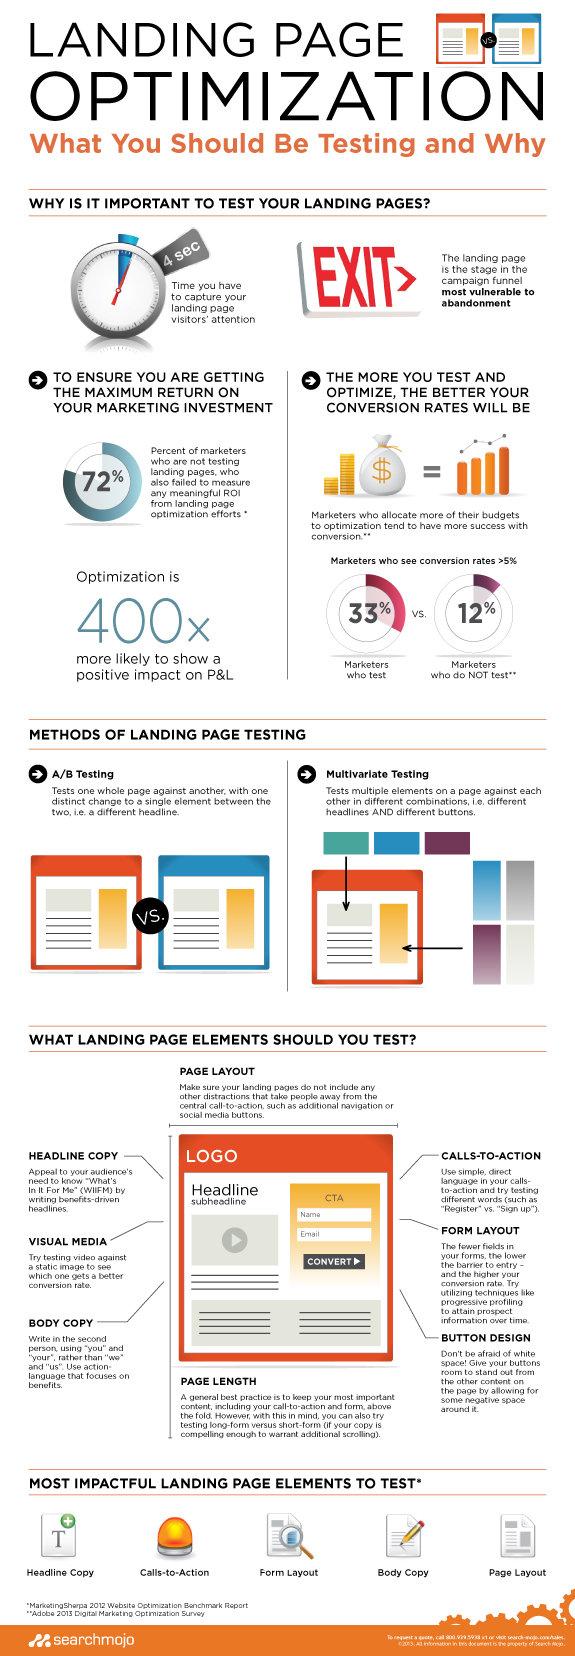 Landing Page Optimization #Infographic.